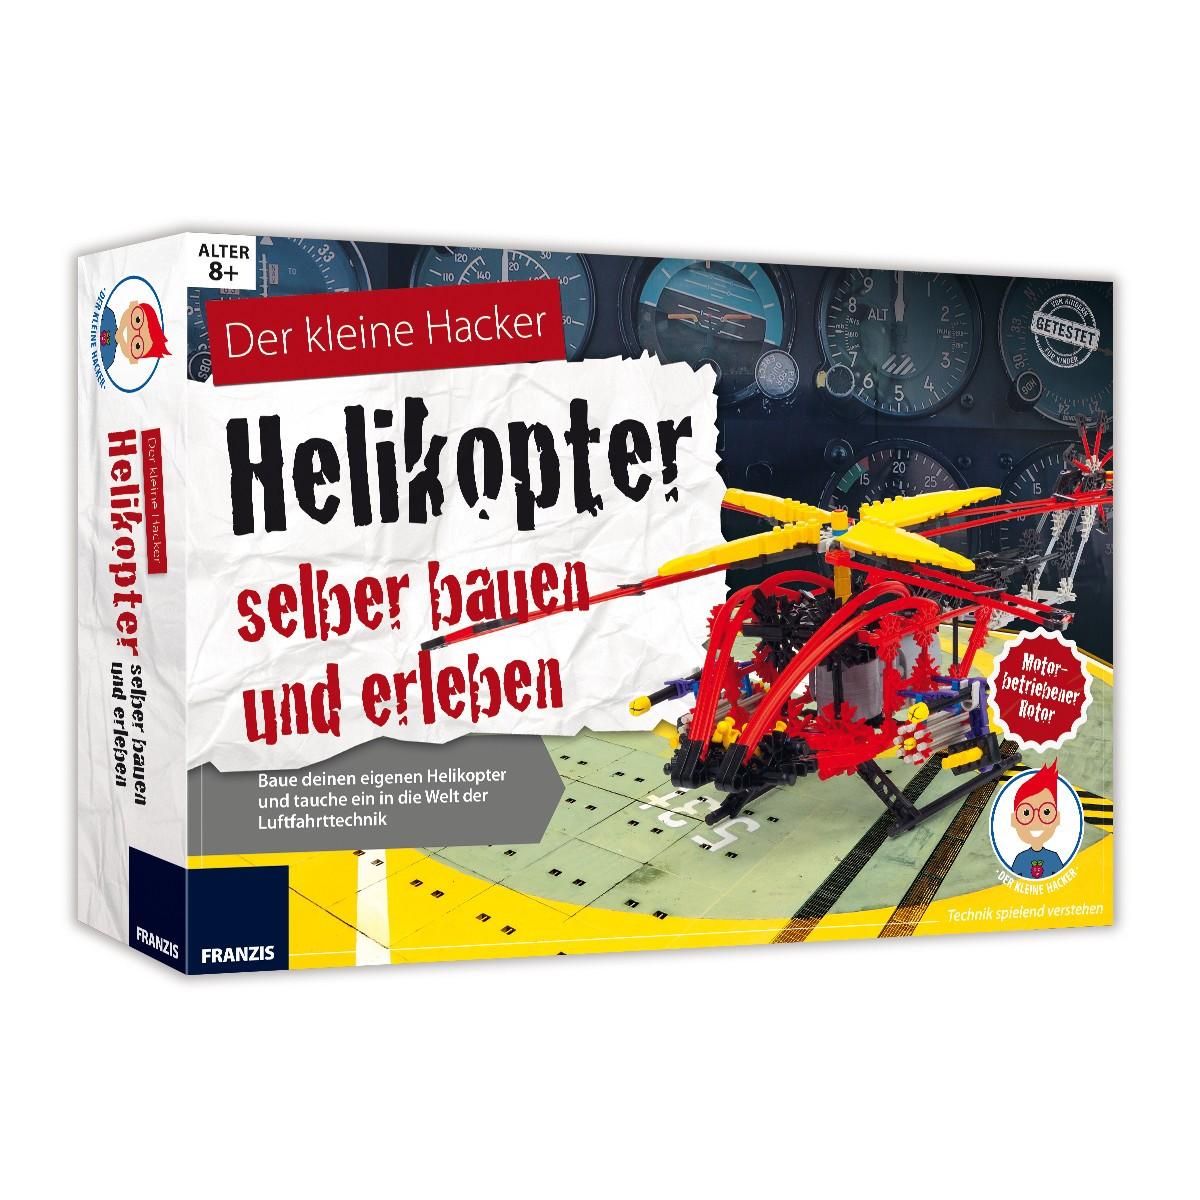 Helikopter-Bausatz